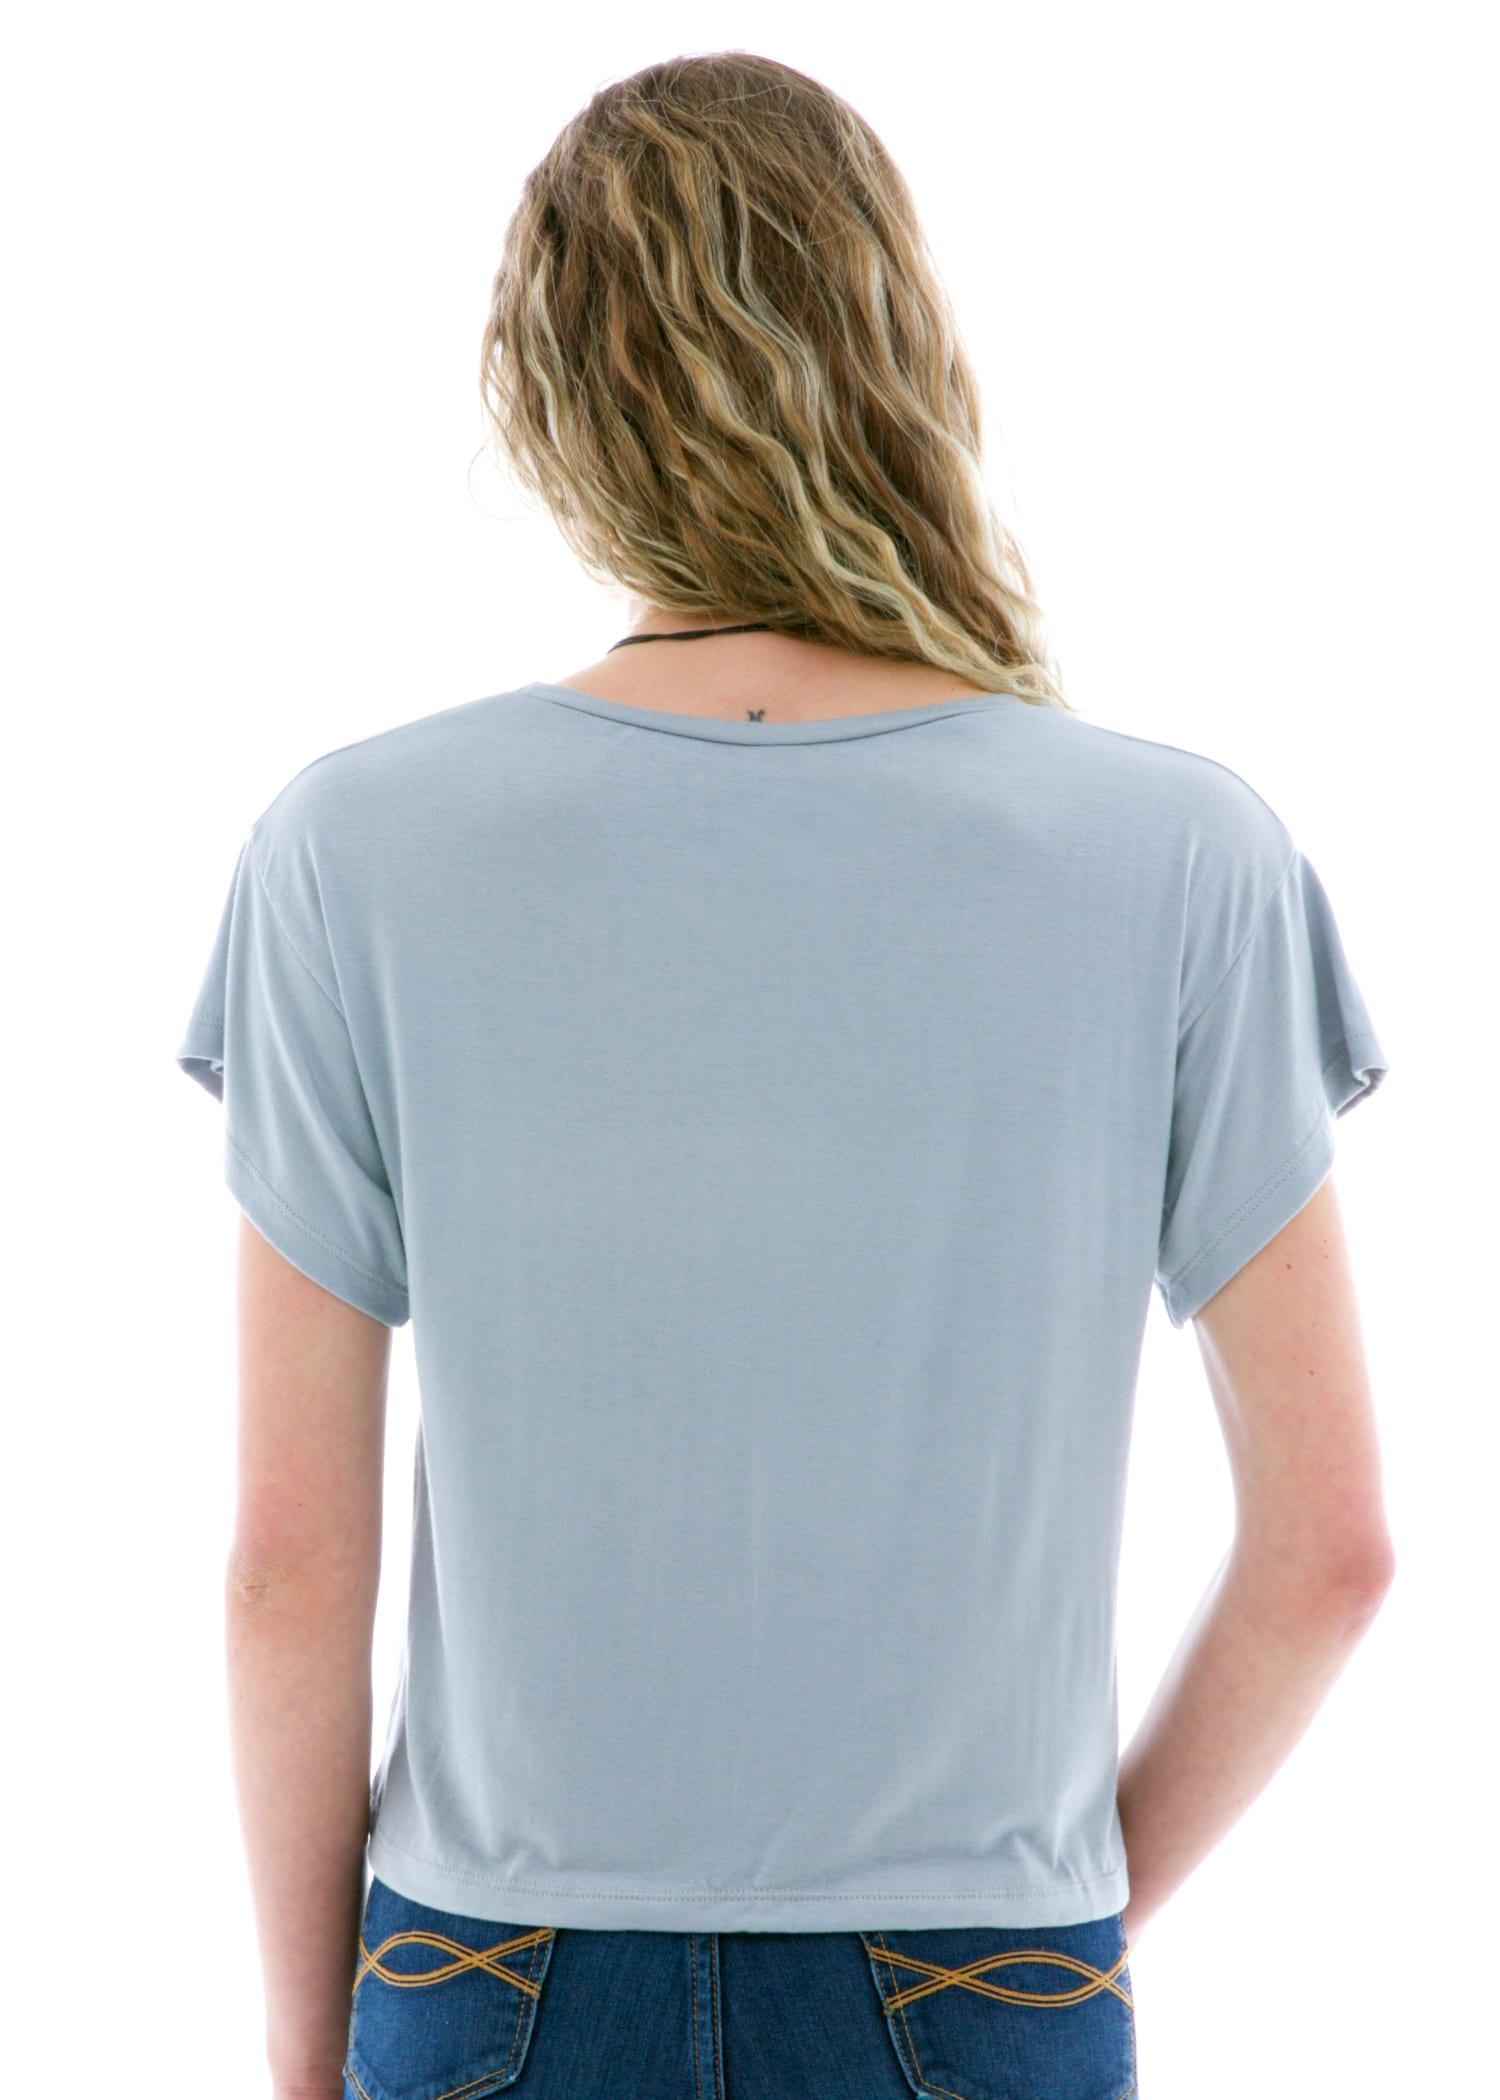 Festival Crew Short Sleeve T-Shirt Back View